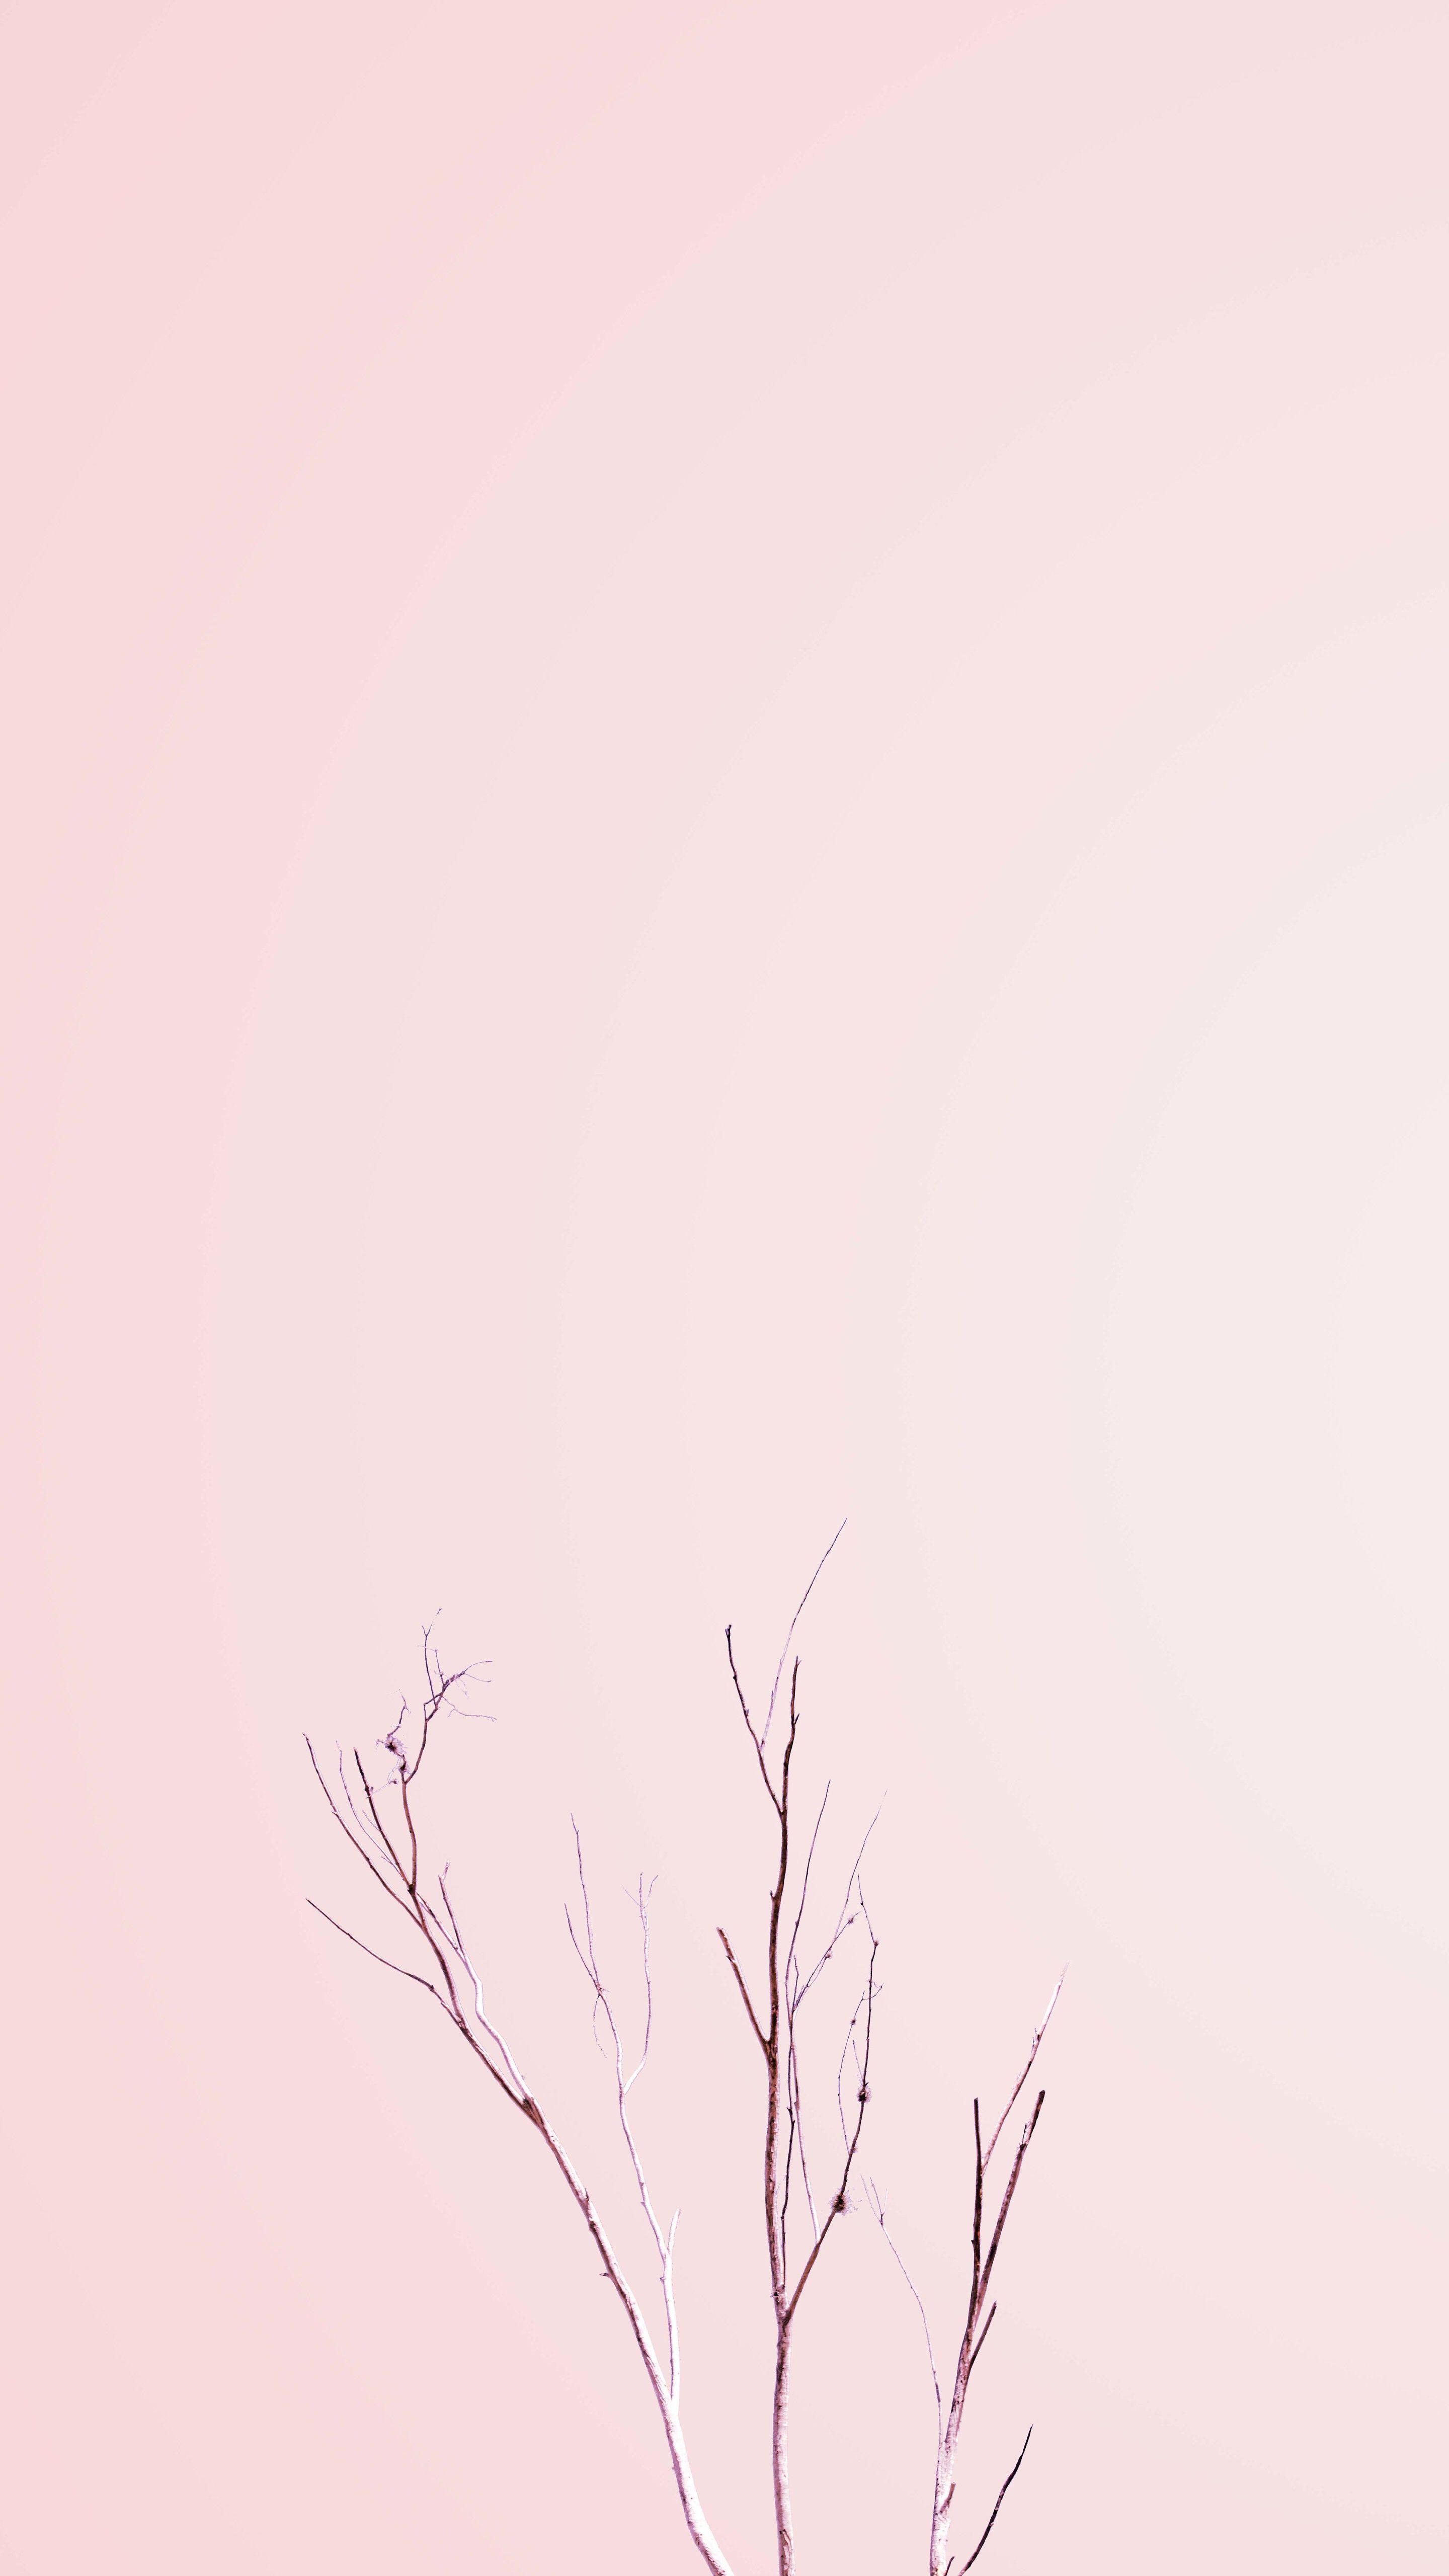 Aesthetic Pastel Minimalist Tumblr Wallpaper